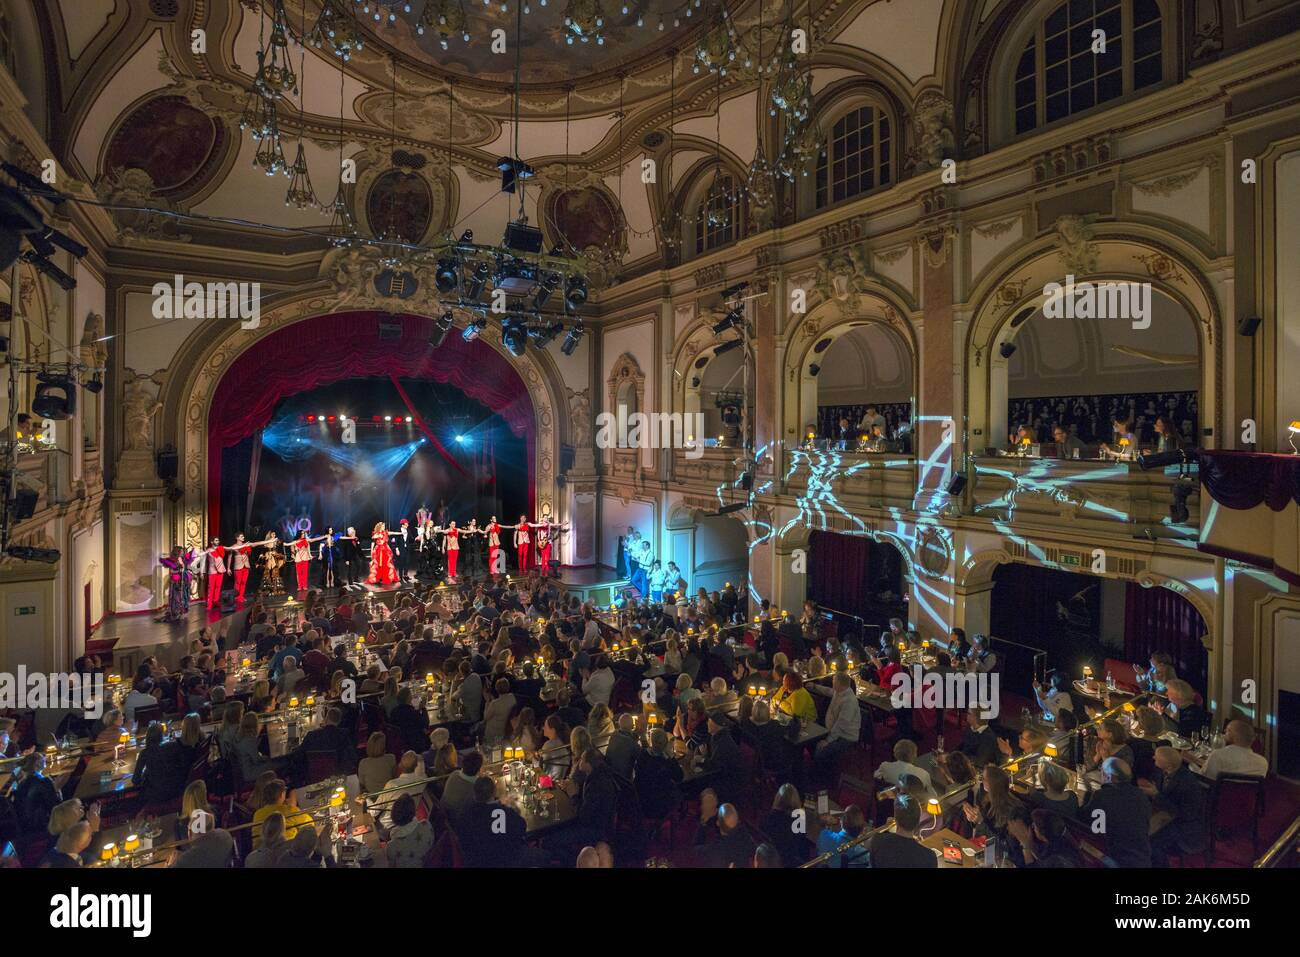 Bad Oeynhausen: GOP Variete-Theater im Kaiserpalais, Teutoburger Wald | usage worldwide Stock Photo